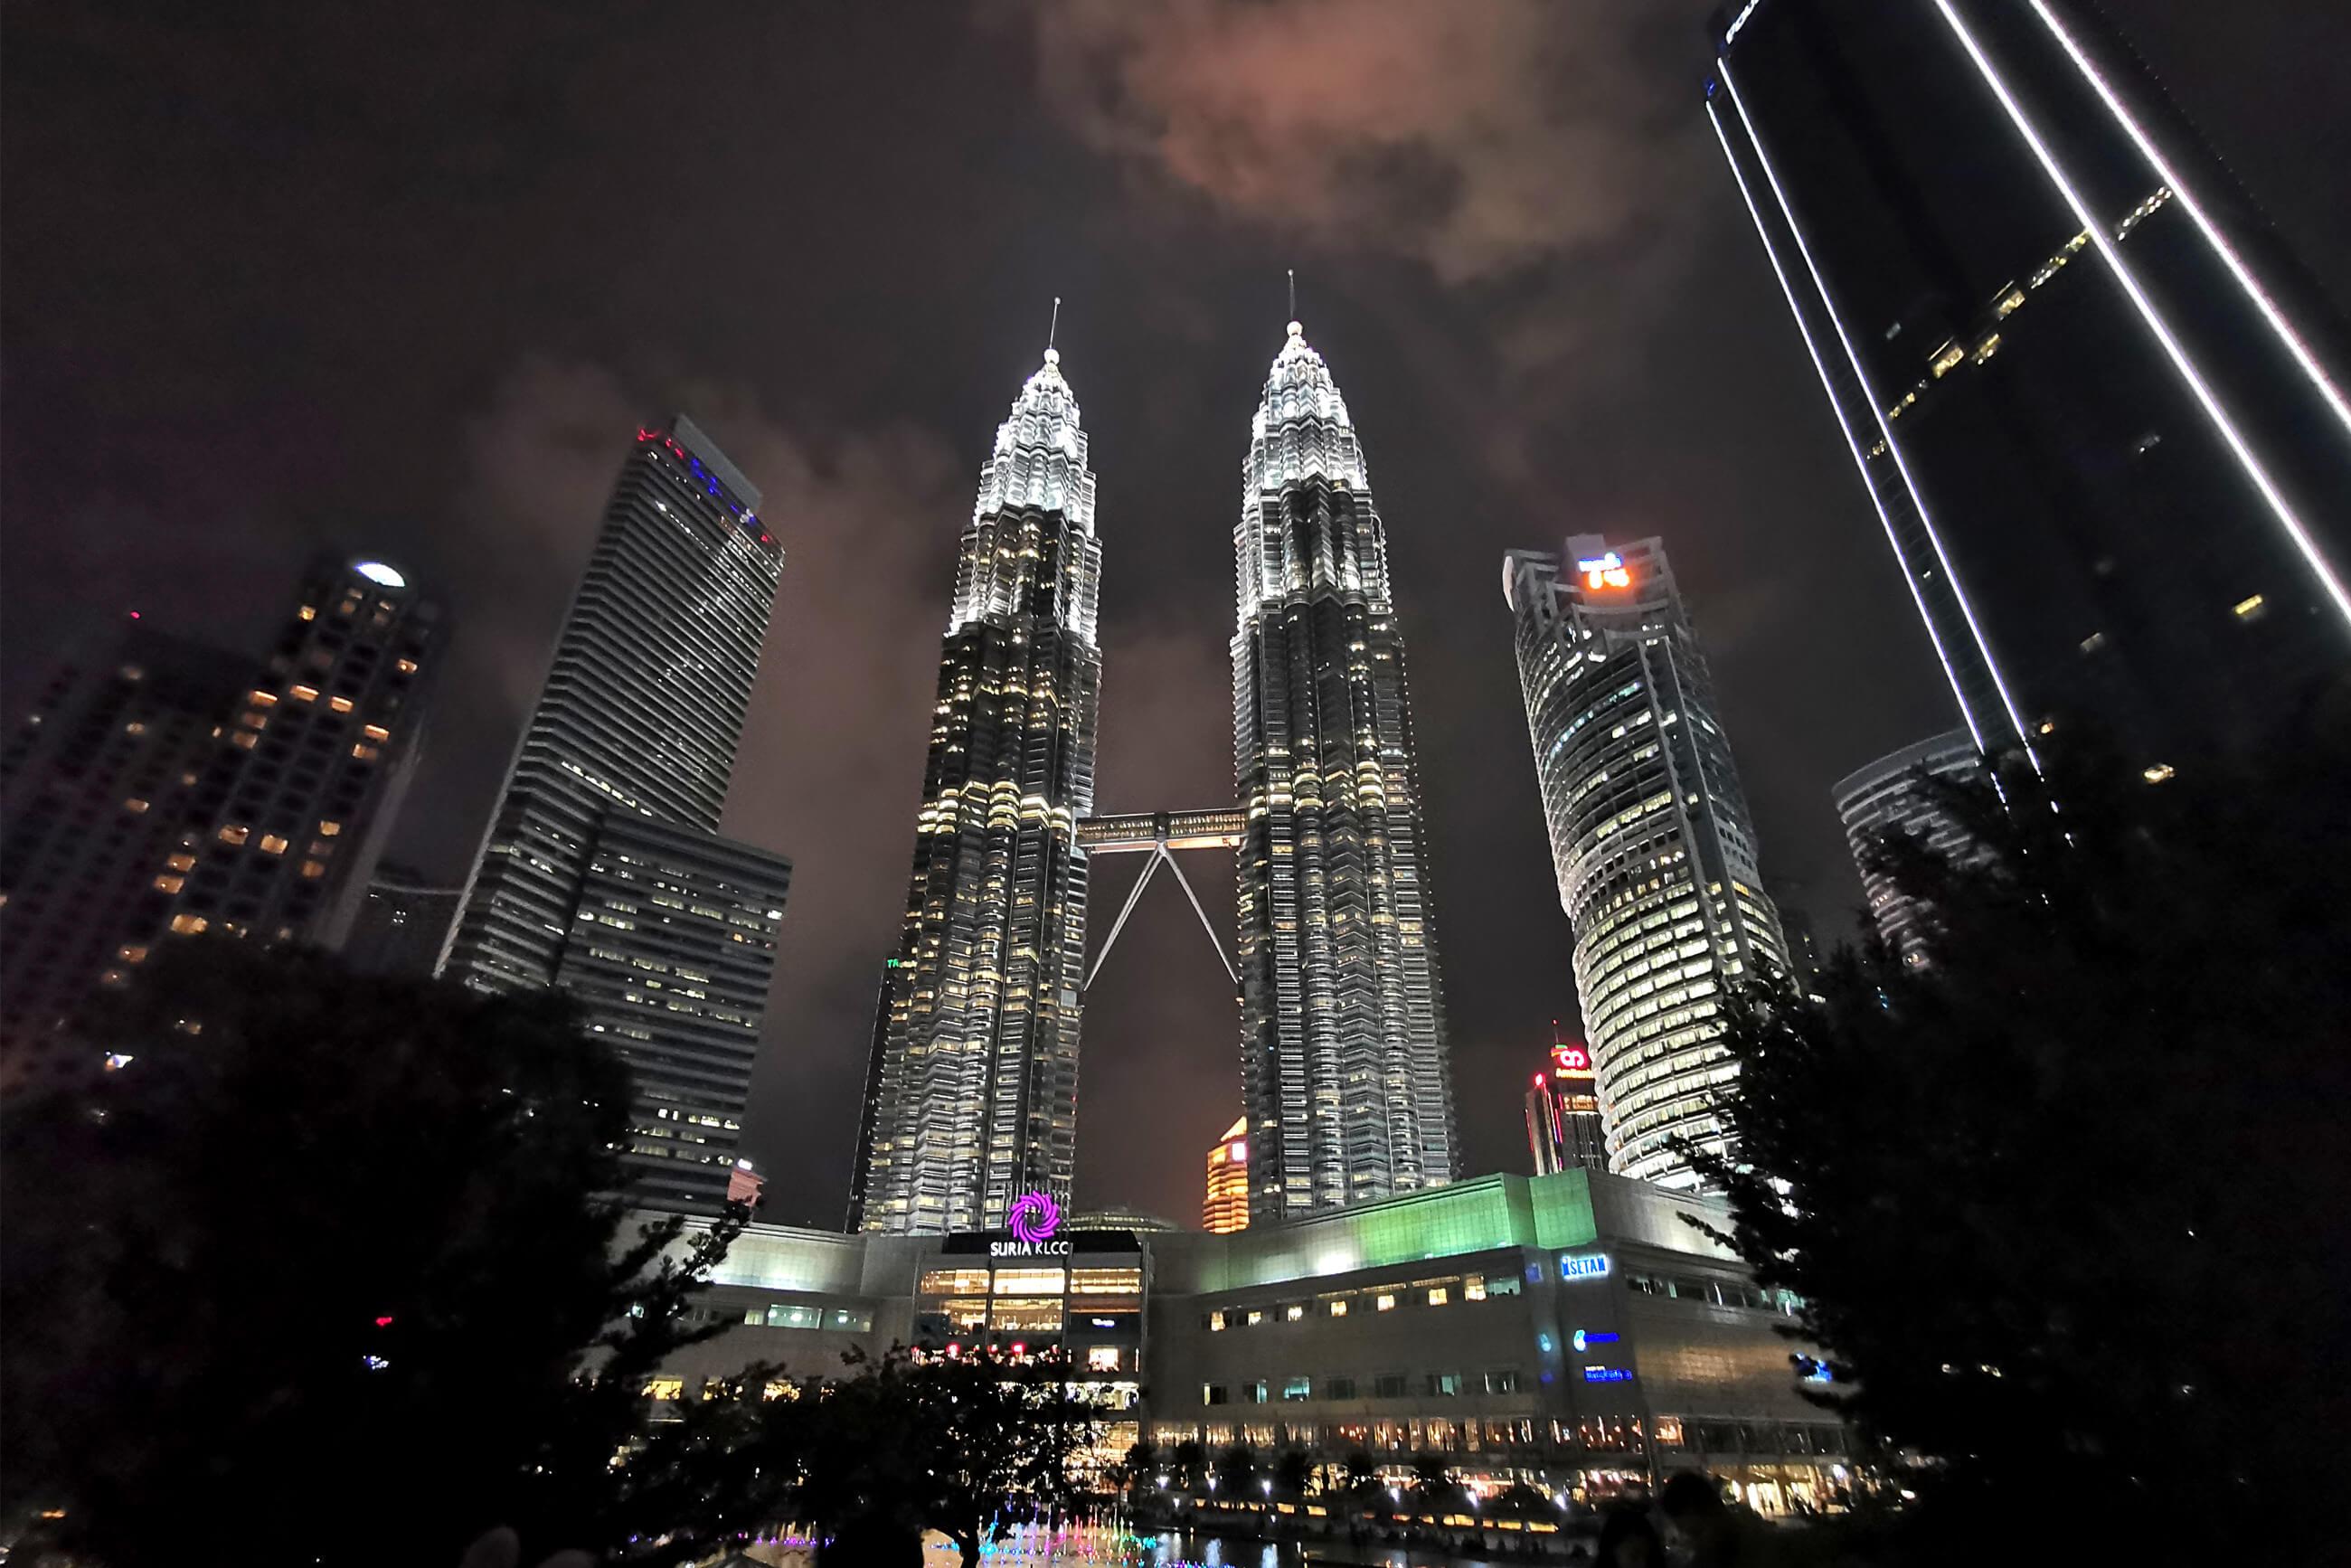 https://bubo.sk/uploads/galleries/7468/jozefmartinasek_malajzia.jpg